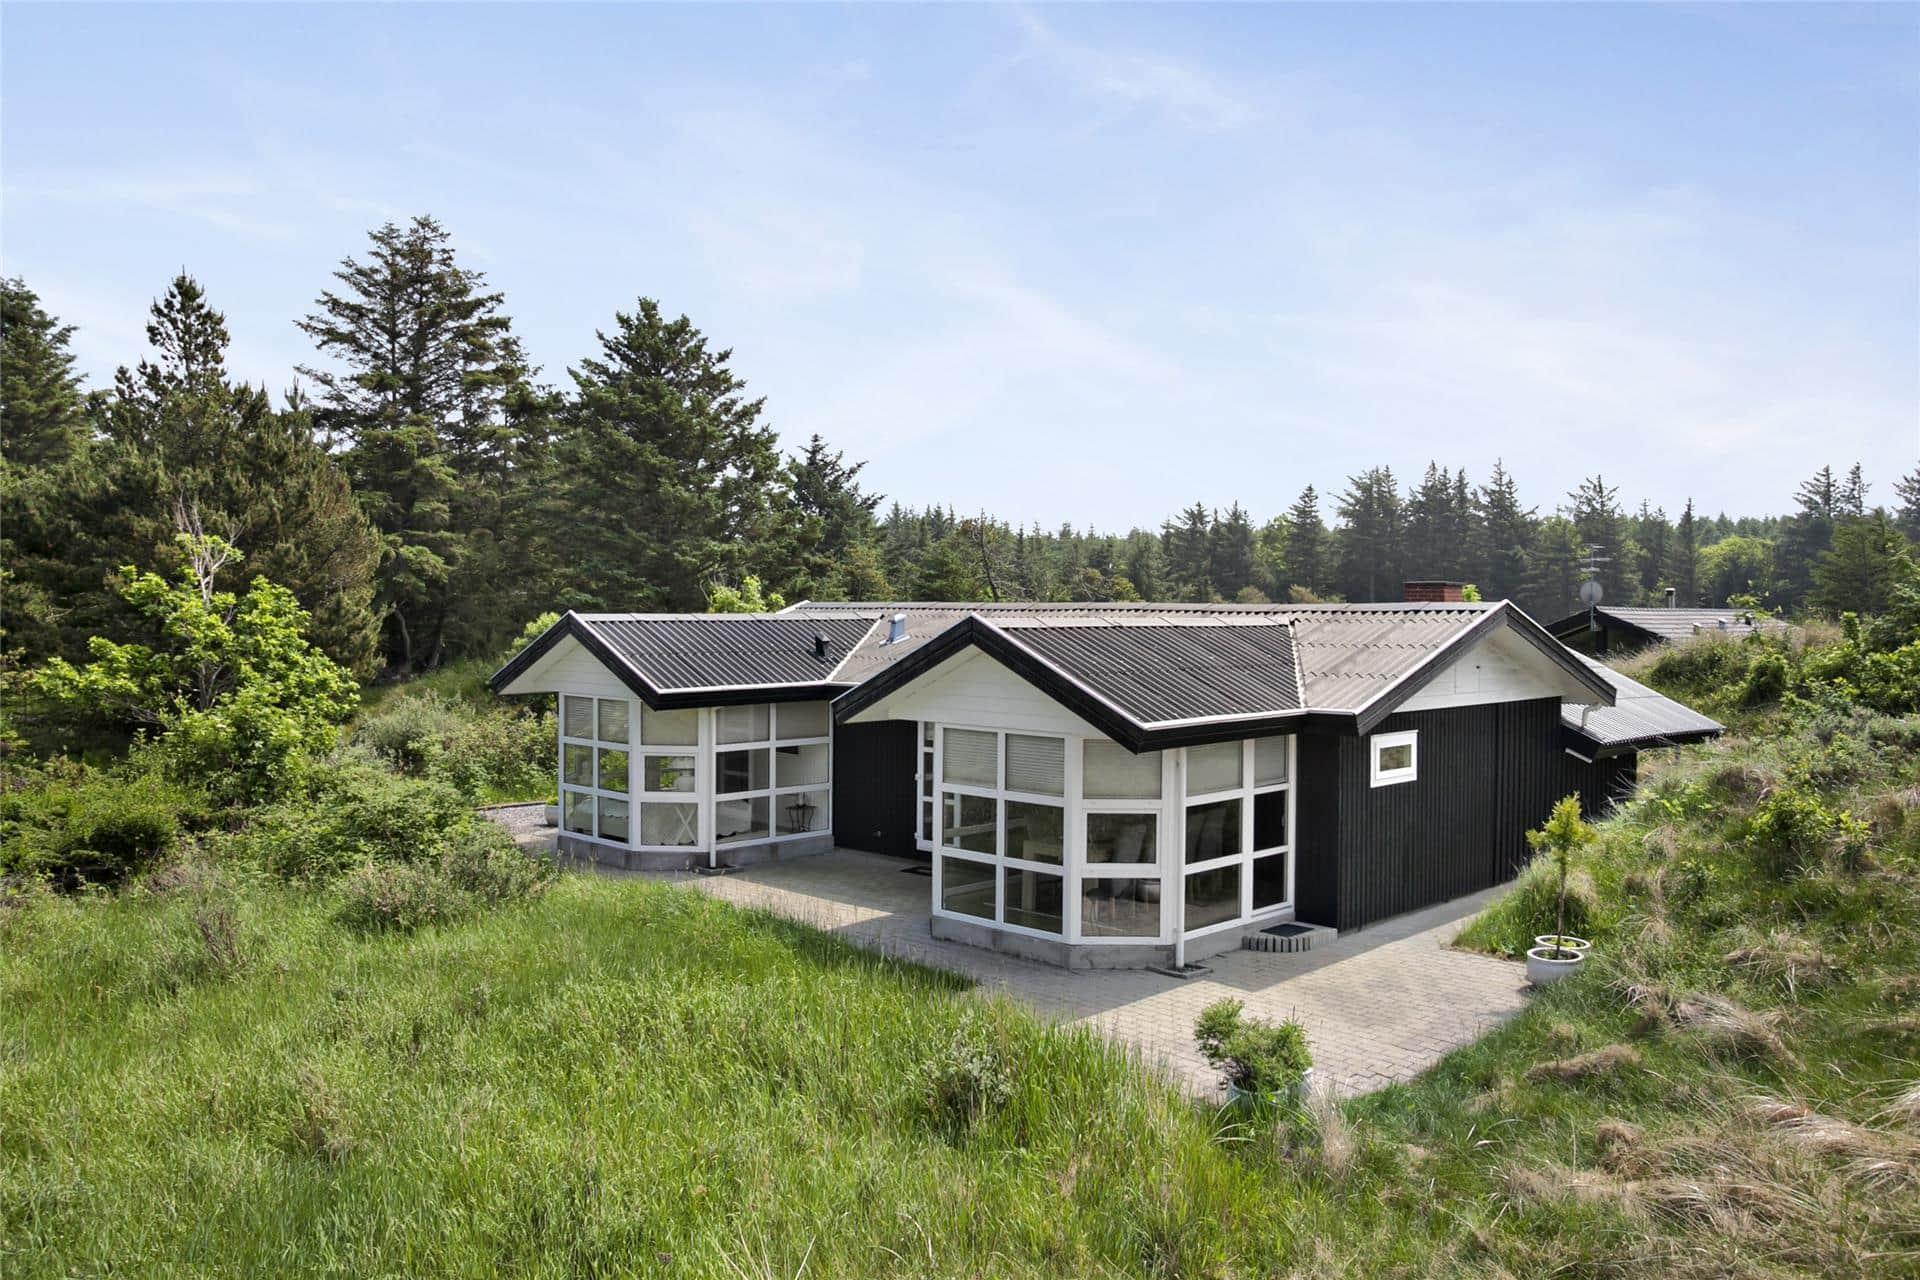 Image 1-14 Holiday-home 1168, Brijdavej 15, DK - 9492 Blokhus